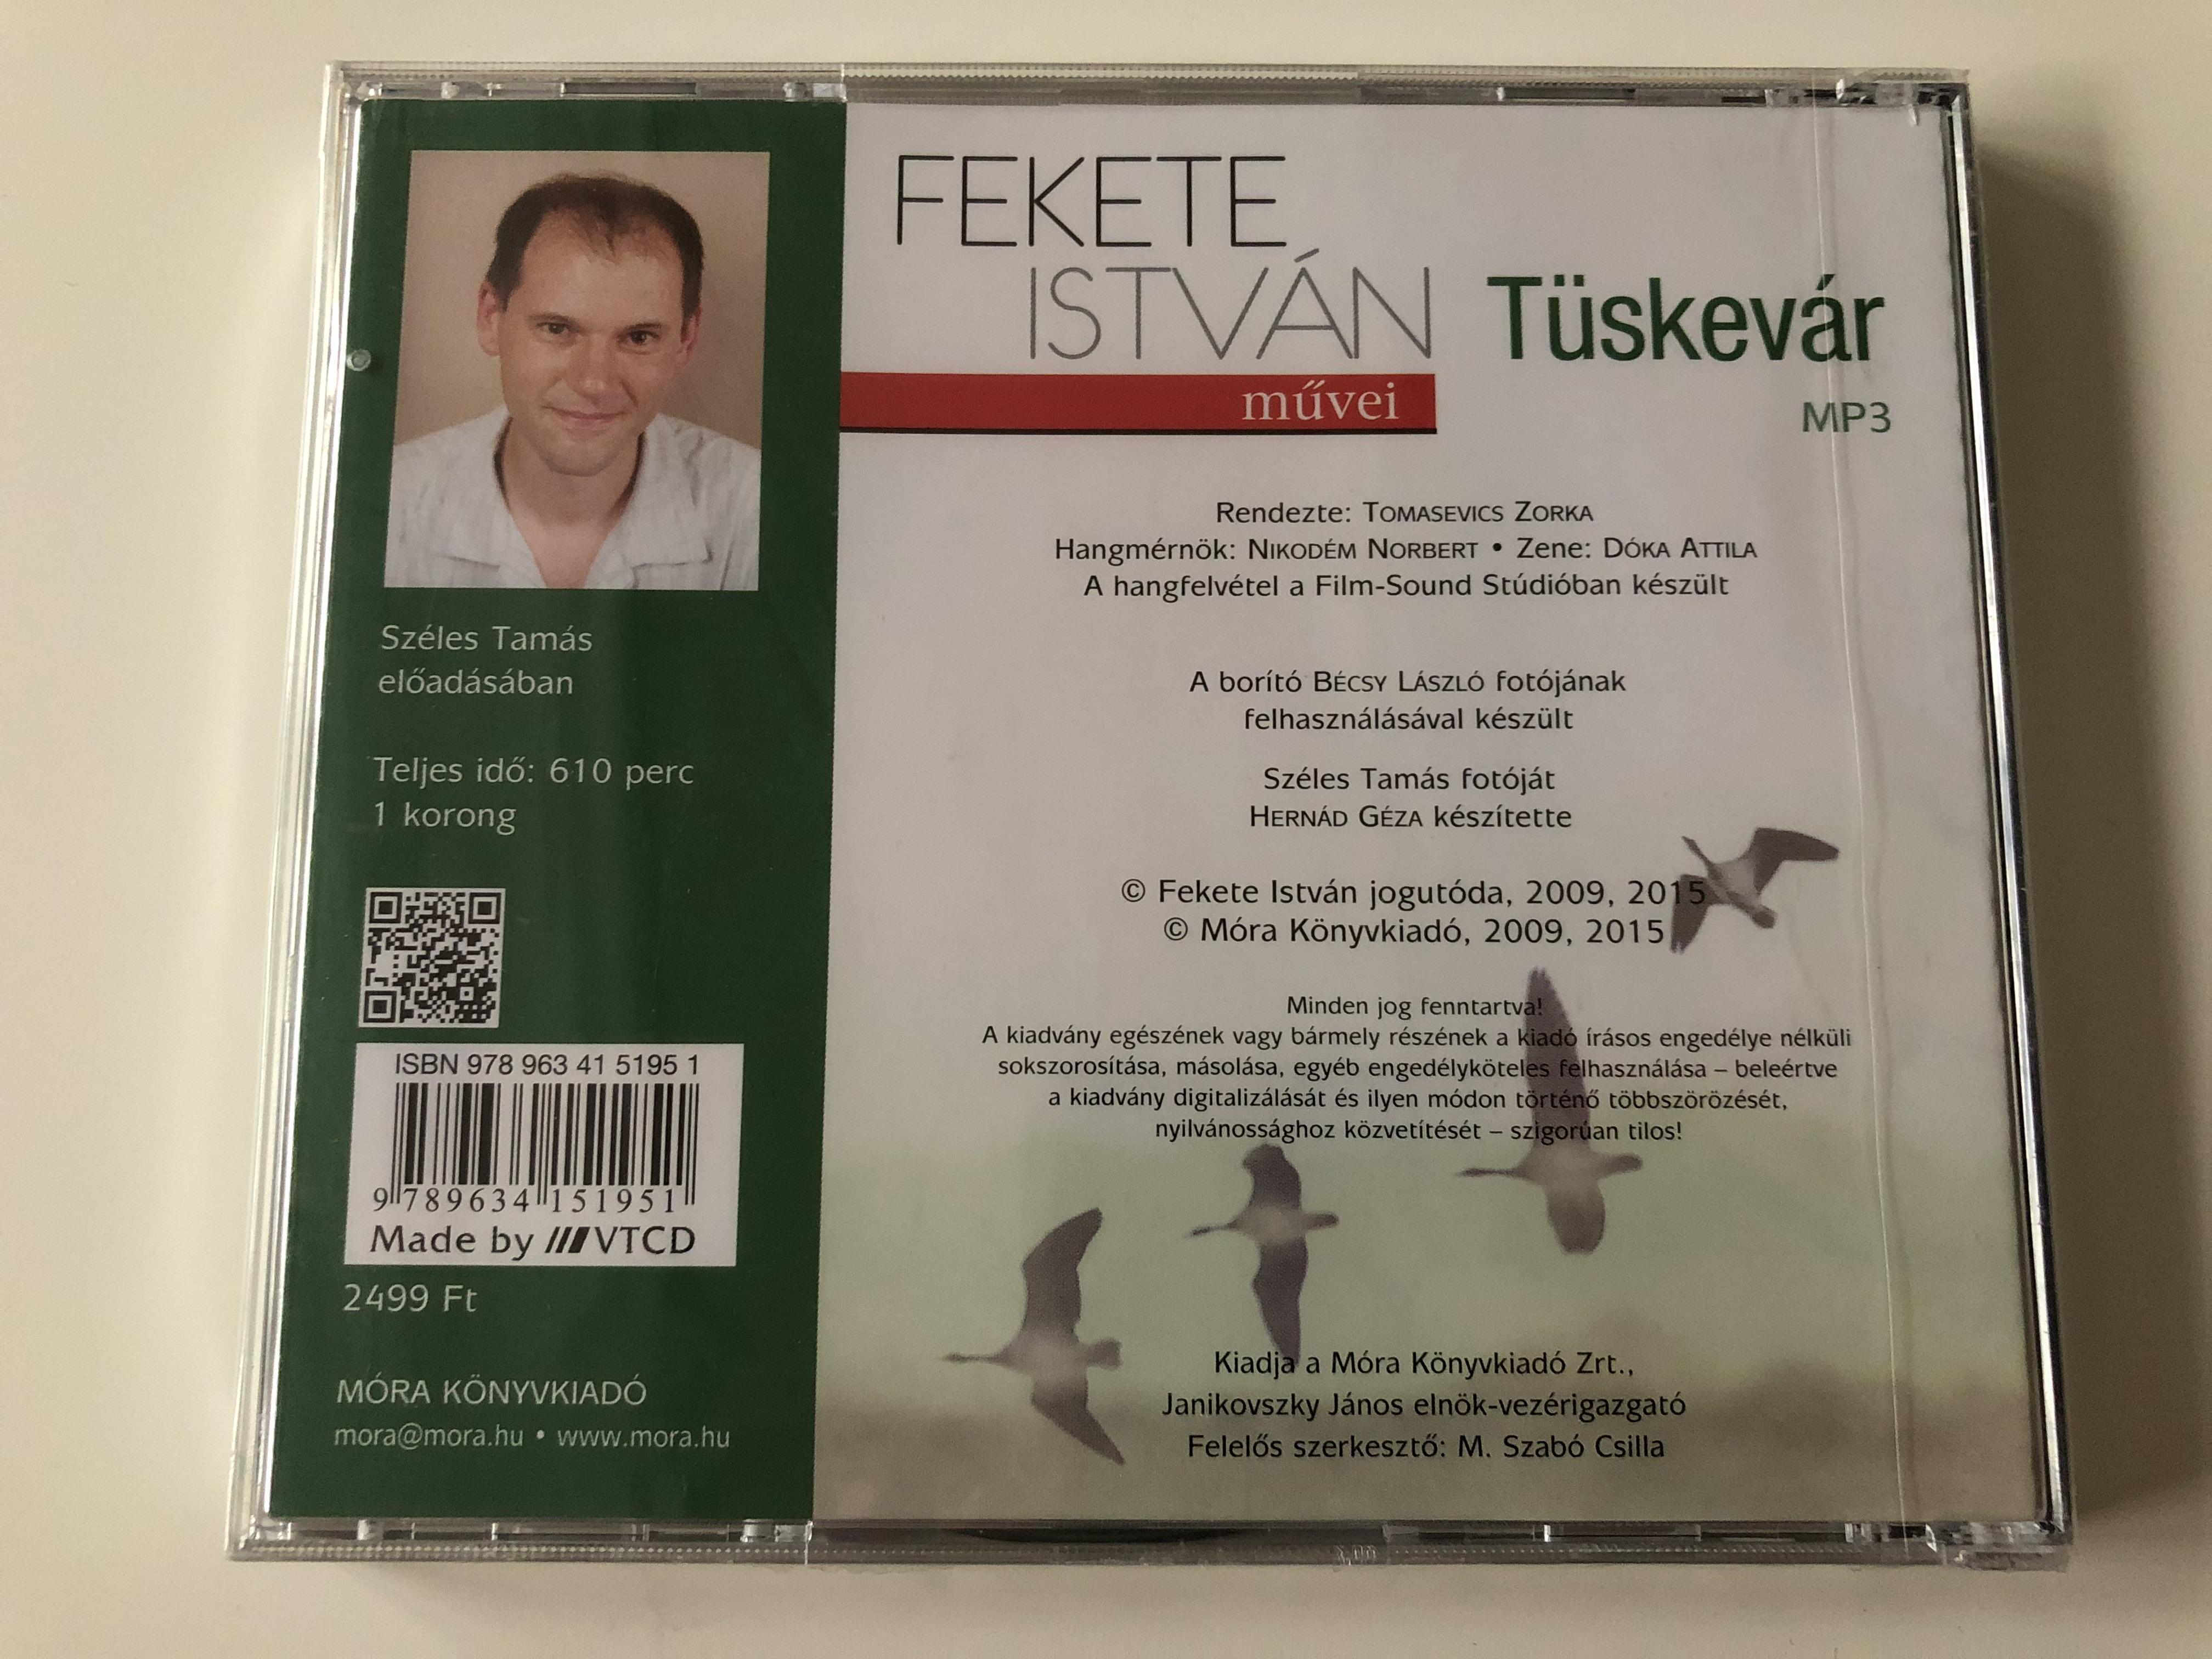 -fekete-istv-n-t-skev-r-hungarian-mp3-audio-book-thorn-castle-read-by-sz-les-tam-s-m-ra-hangosk-nyv-2015-classic-hungarian-literature-3-.jpg